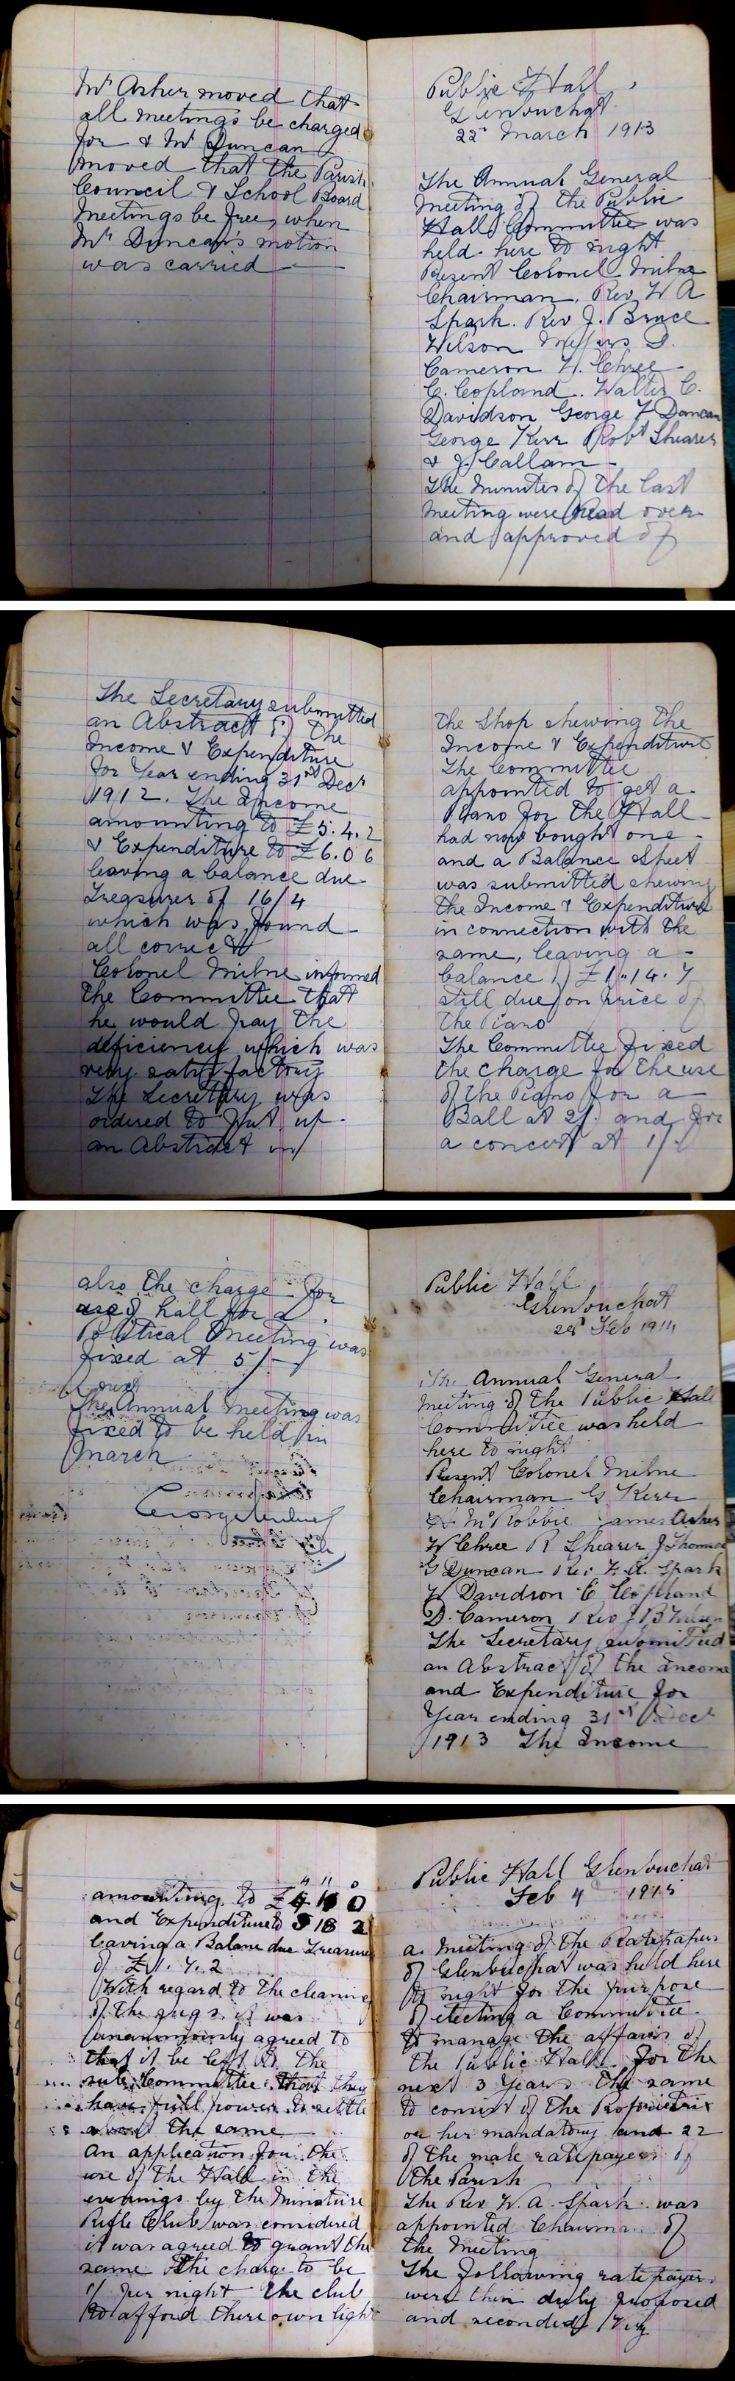 26 Glenbuchat Hall Committee Minutes